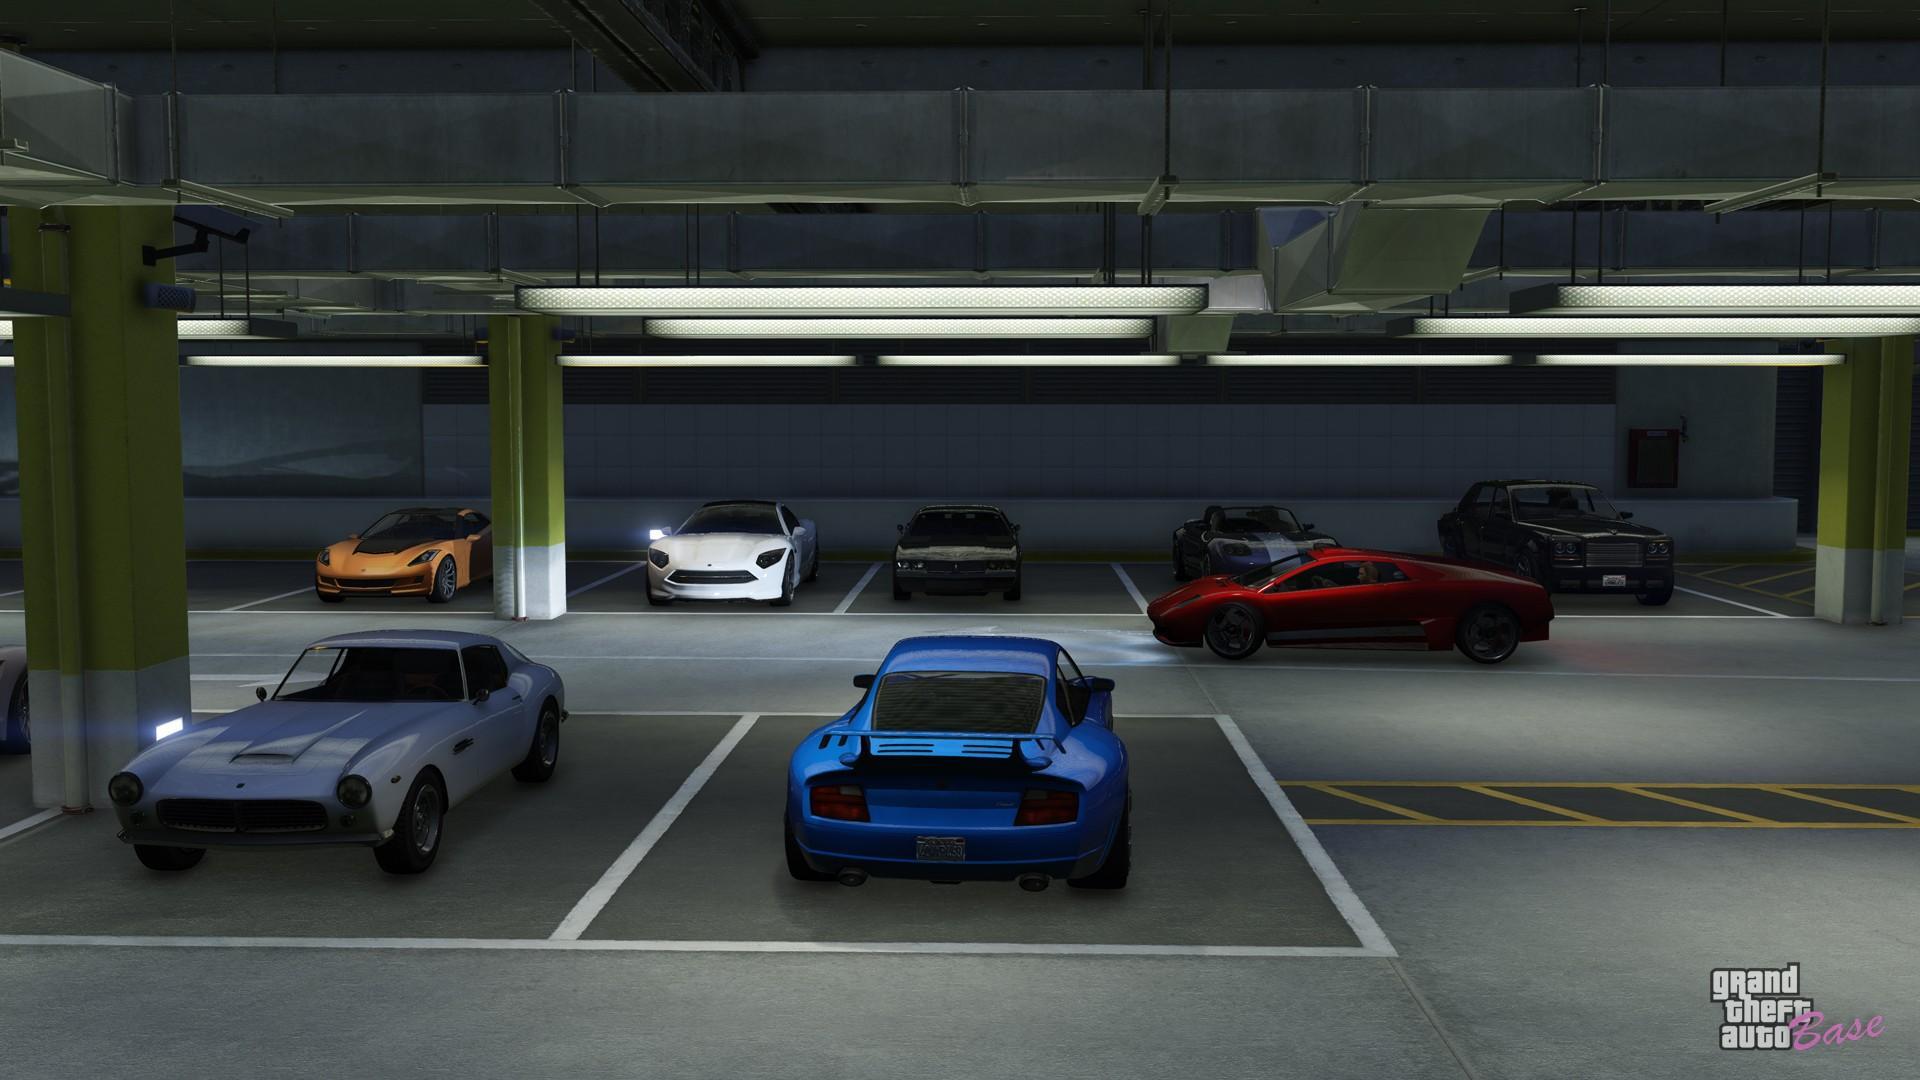 GTA Online Casino Penthouse (The Diamond): Info, Price